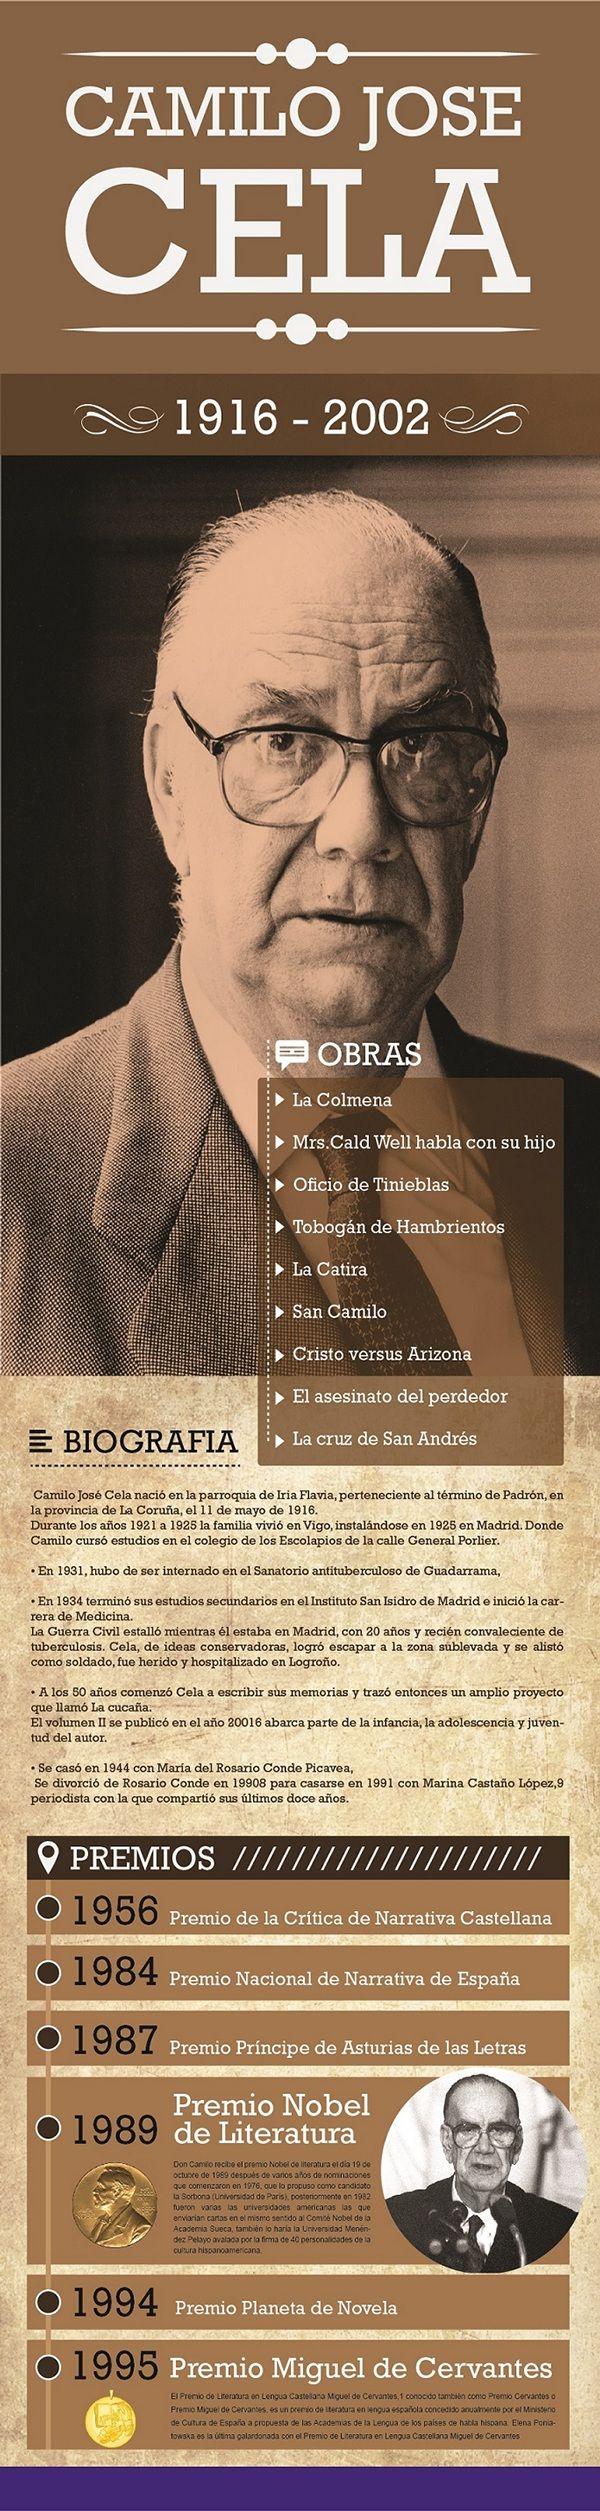 Infografia de Camilo Jose Cela on Behance